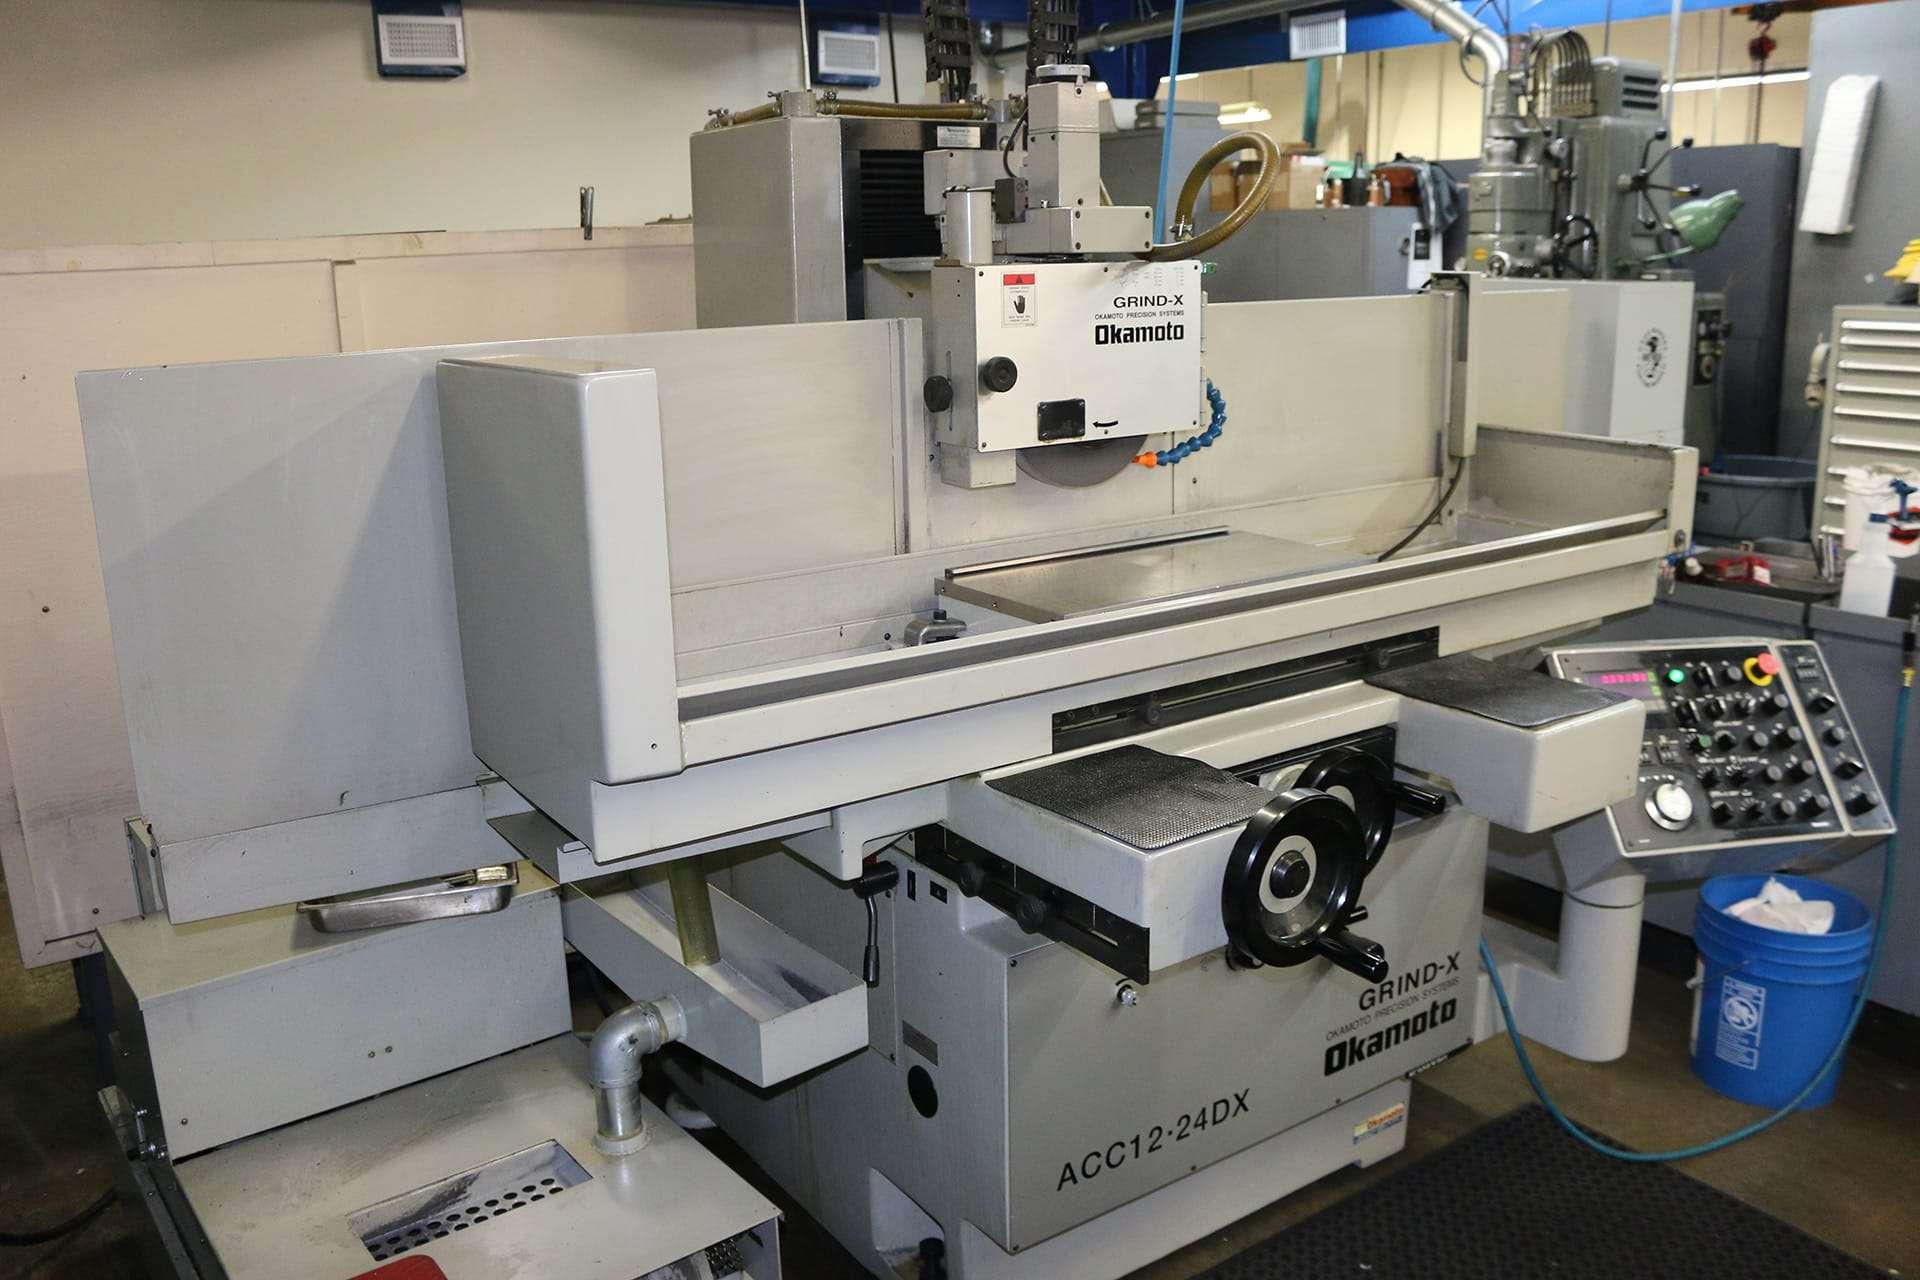 okamoto grind-x surface grinding machine